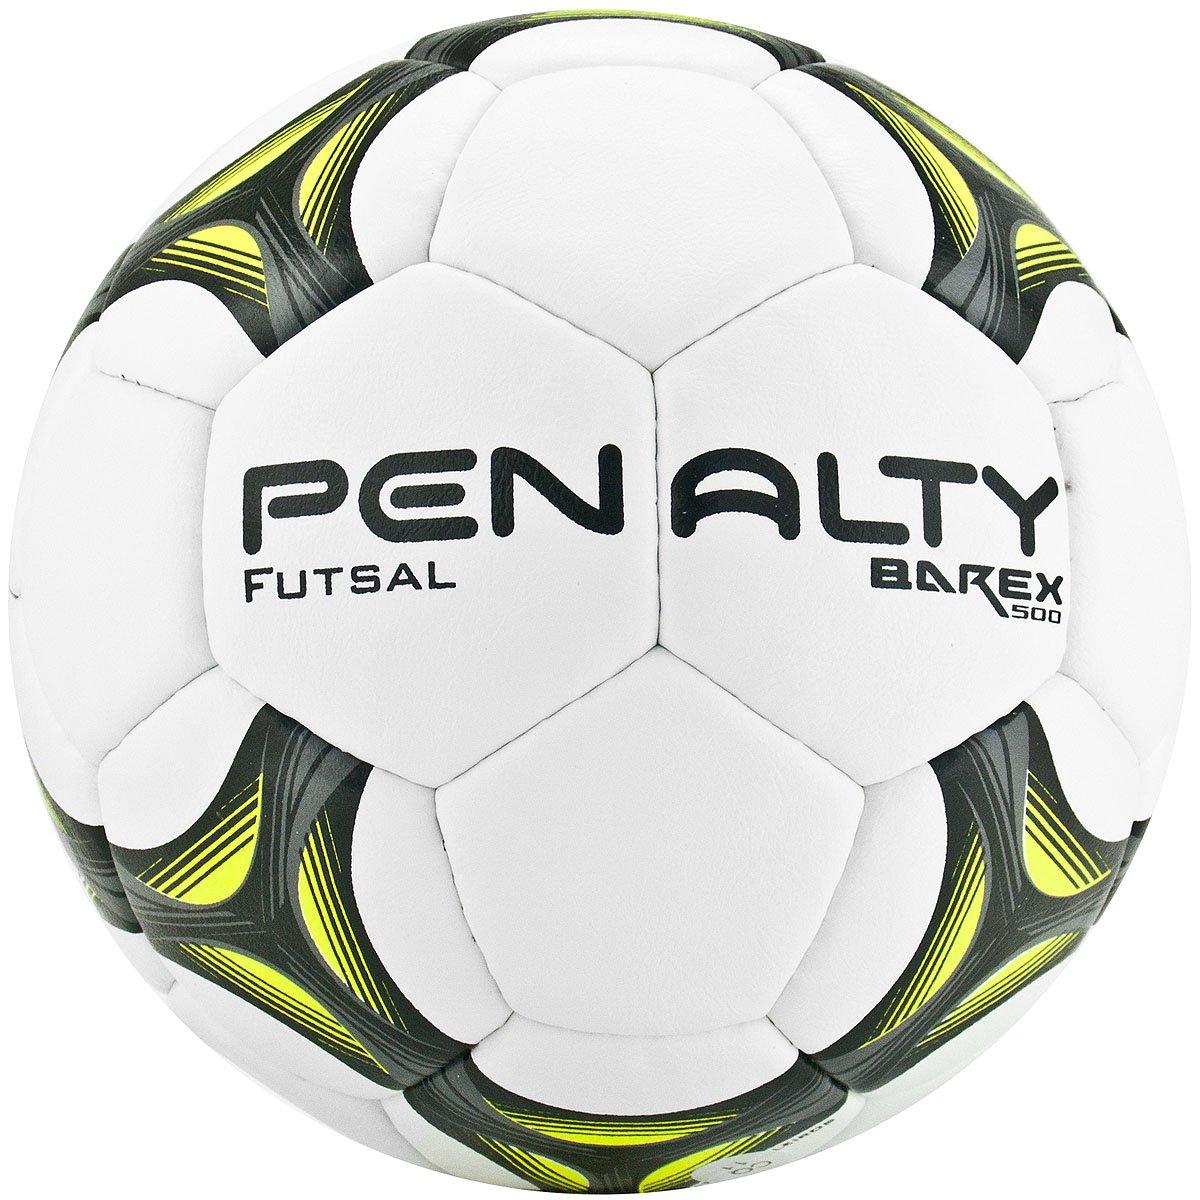 Bola Penalty Futsal Barex 500 VII  a0b264ed69981